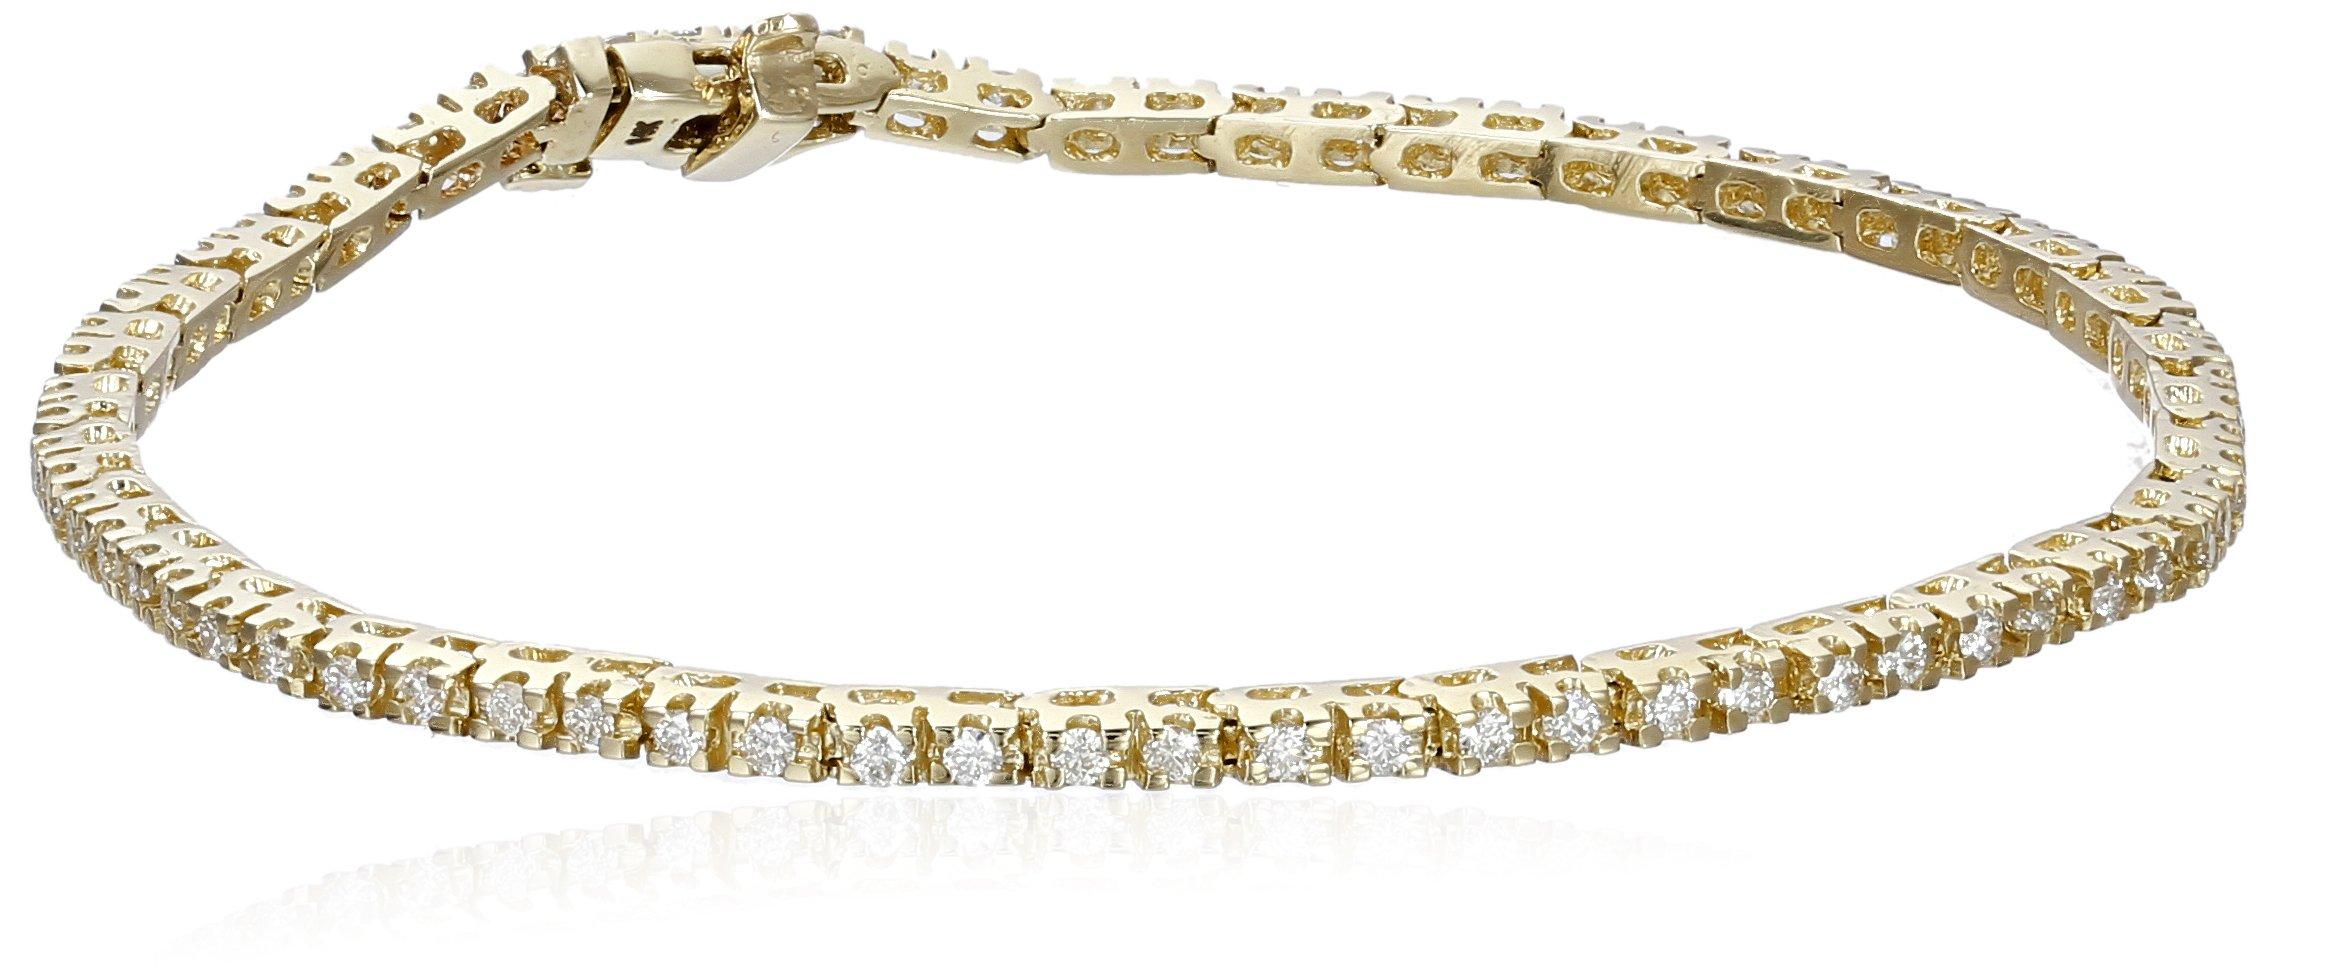 IGI Certified 14k Yellow Gold Diamond Tennis Bracelet (1cttw, H-I Color, I1 Clarity), 7''